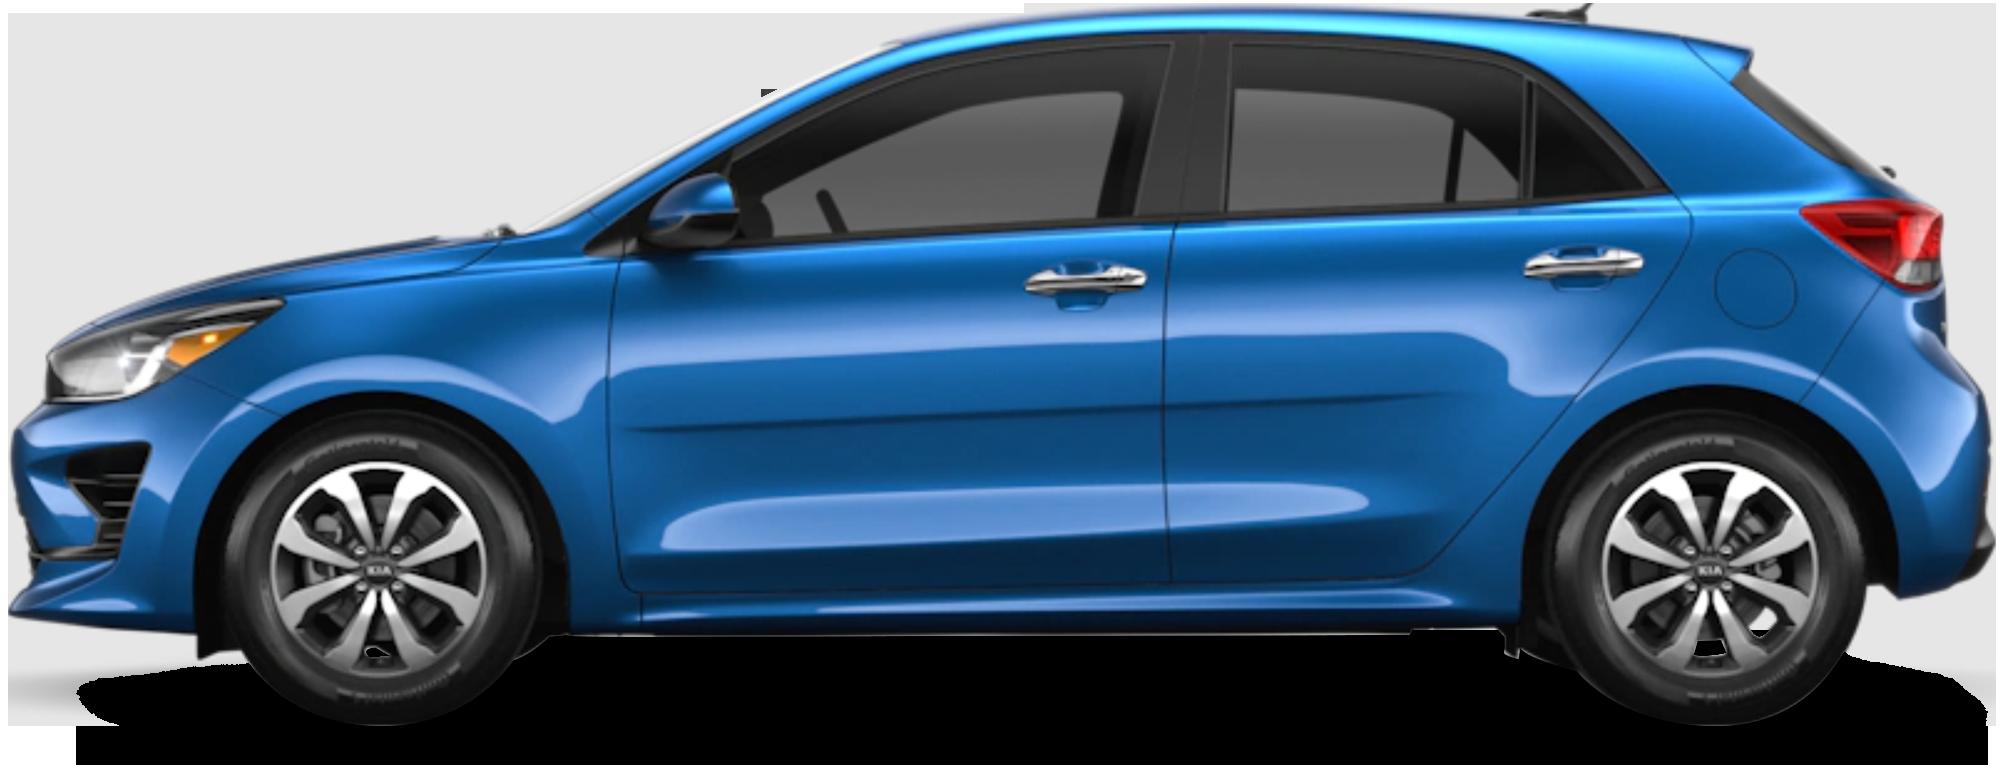 2021 Kia Rio Hatchback S